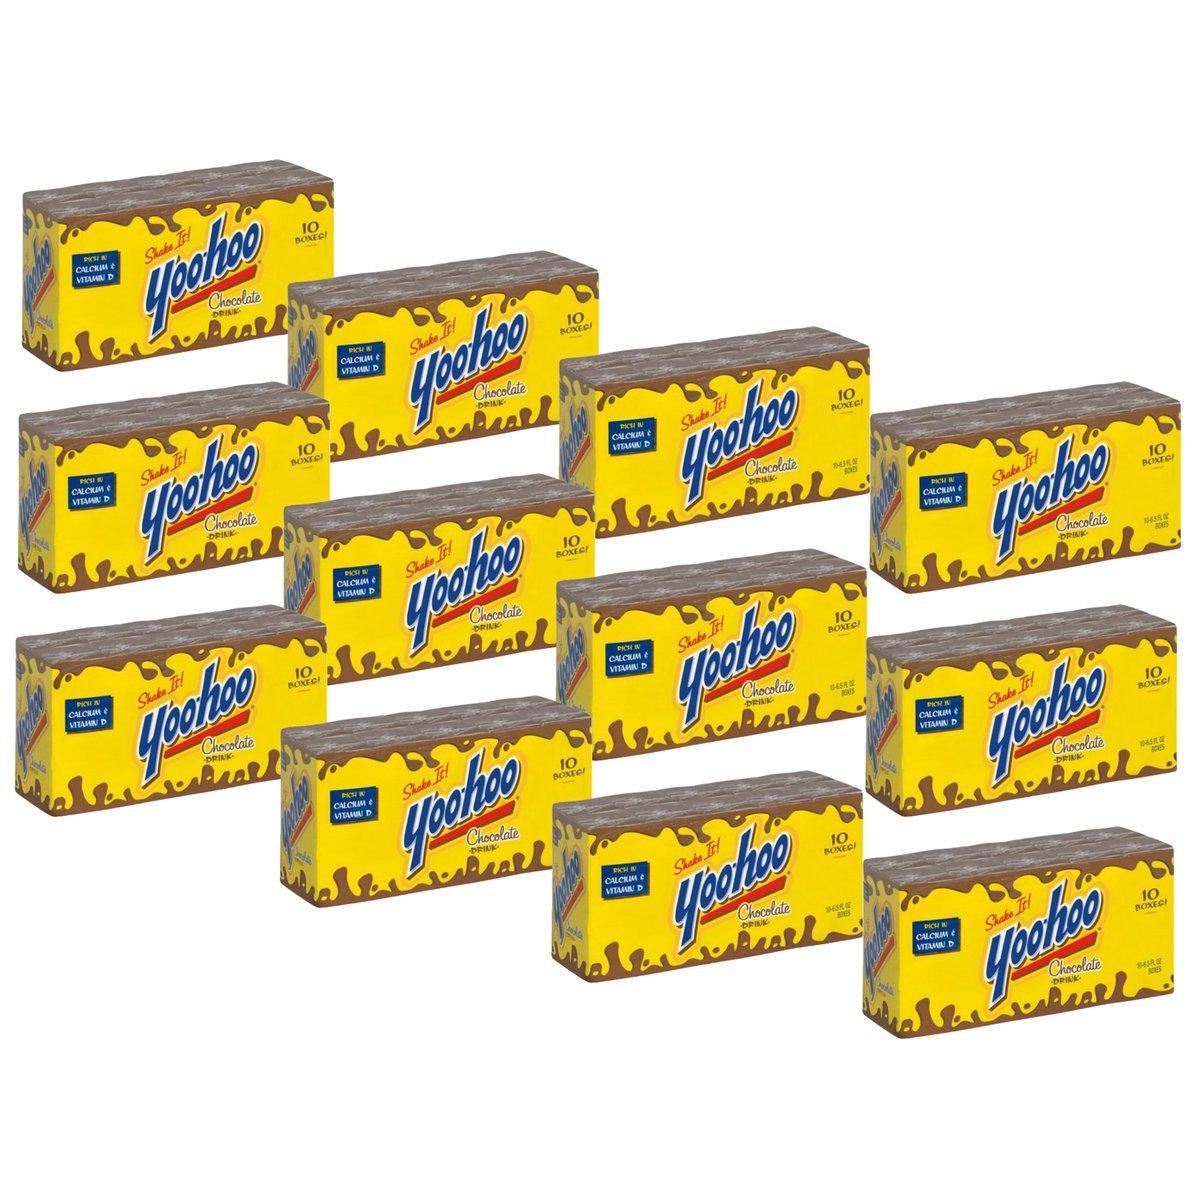 Yoo-hoo Chocolate Drink, 6.5 fl oz boxes, 10 count (Pack of 12)